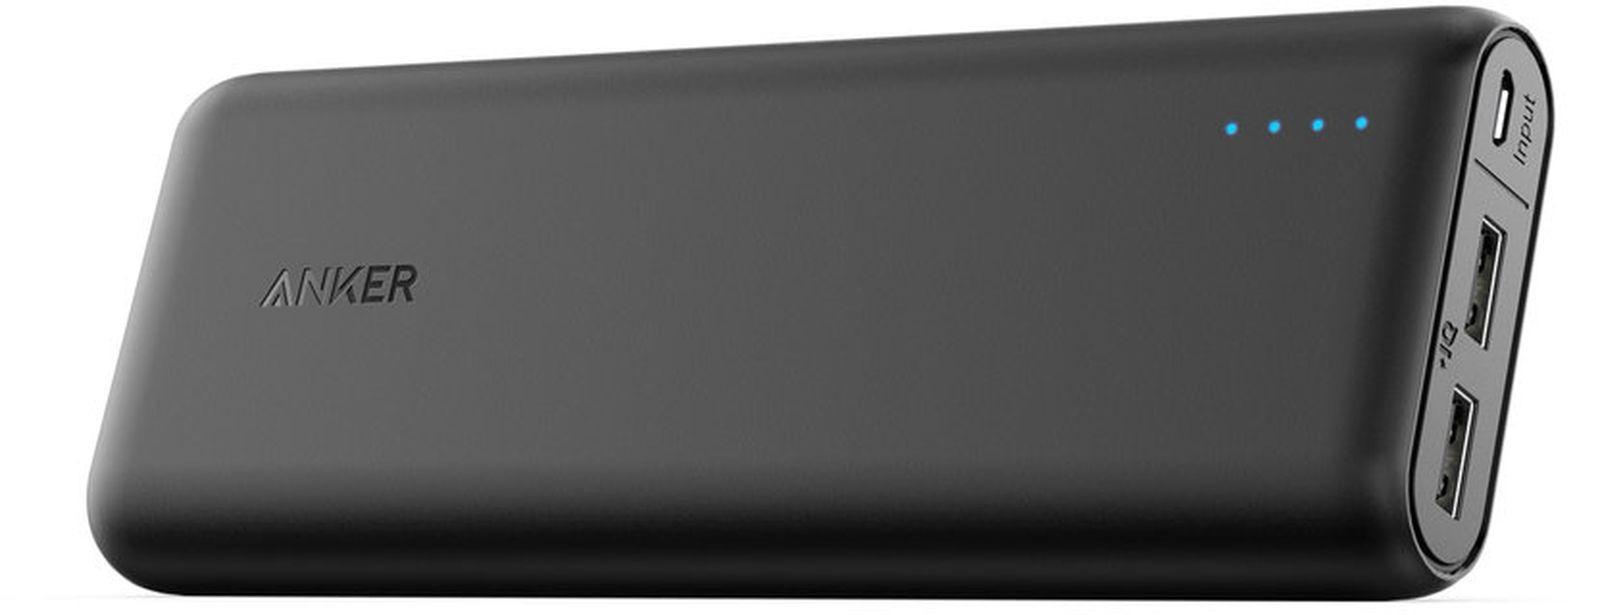 Внешний аккумулятор Anker PowerCore External Battery 15600mAh, black стоимость